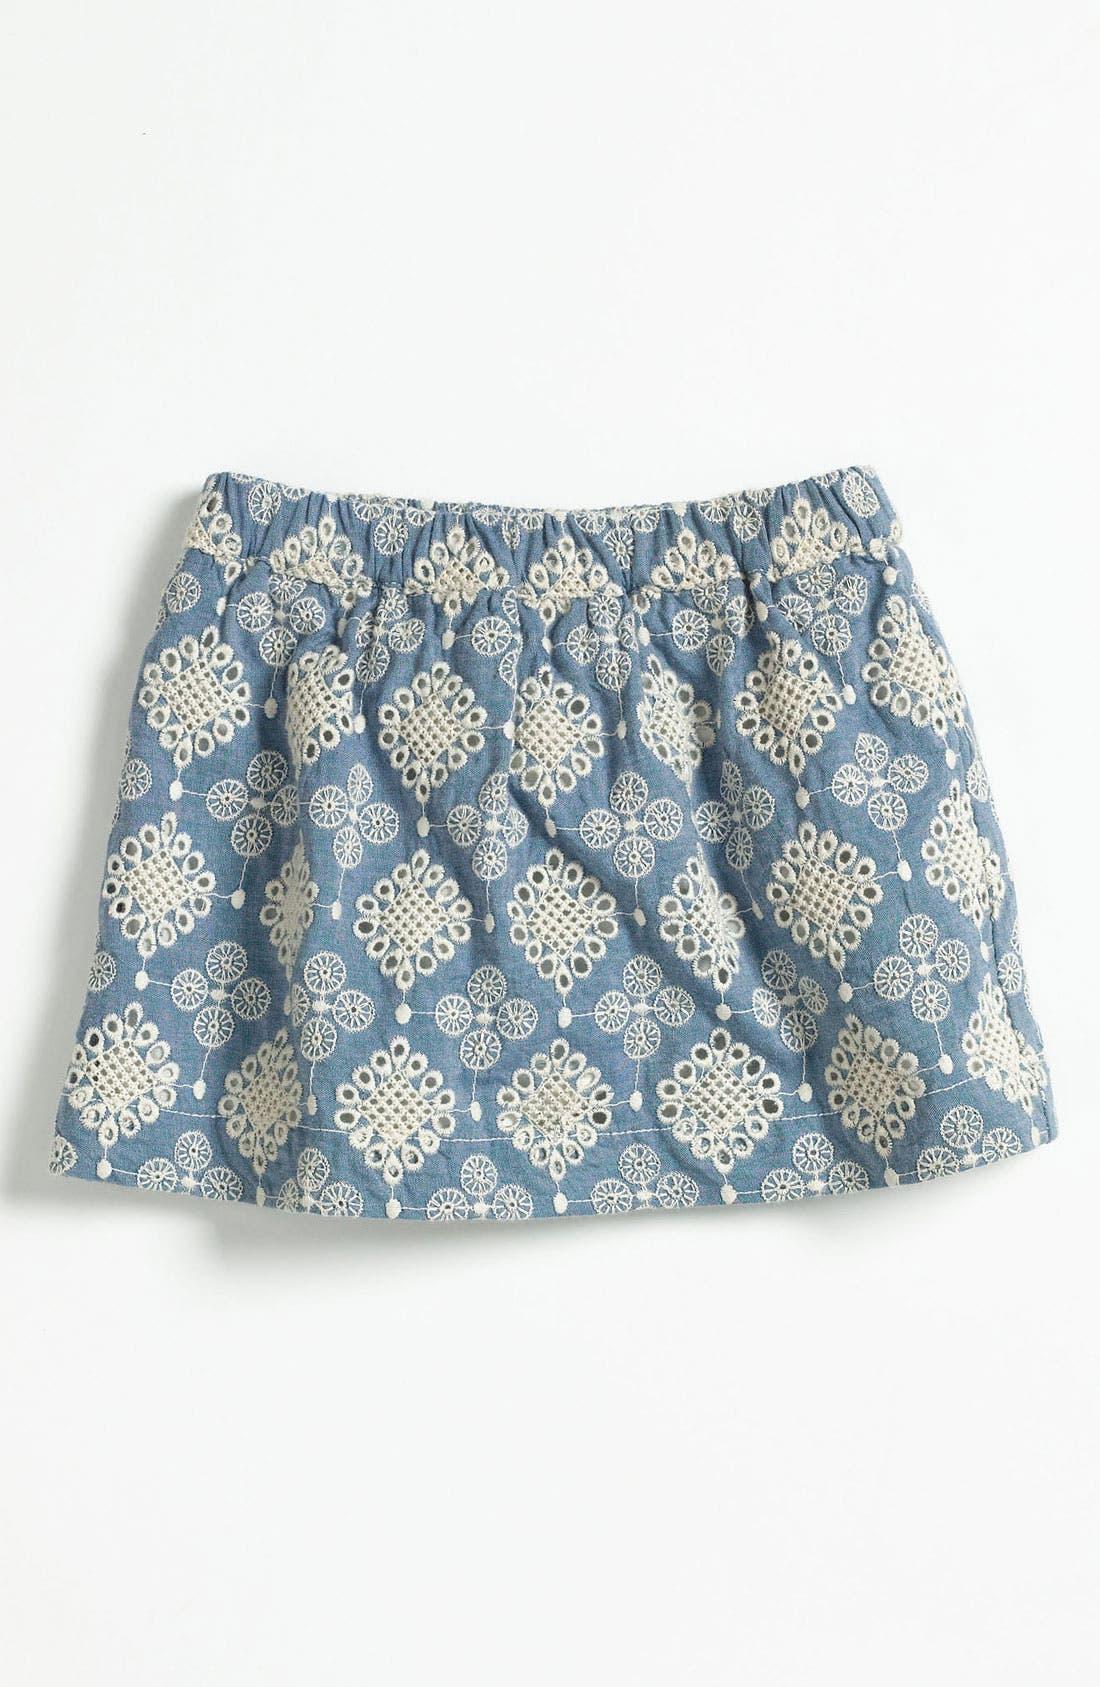 Alternate Image 1 Selected - Peek 'Nina' Skirt (Baby)